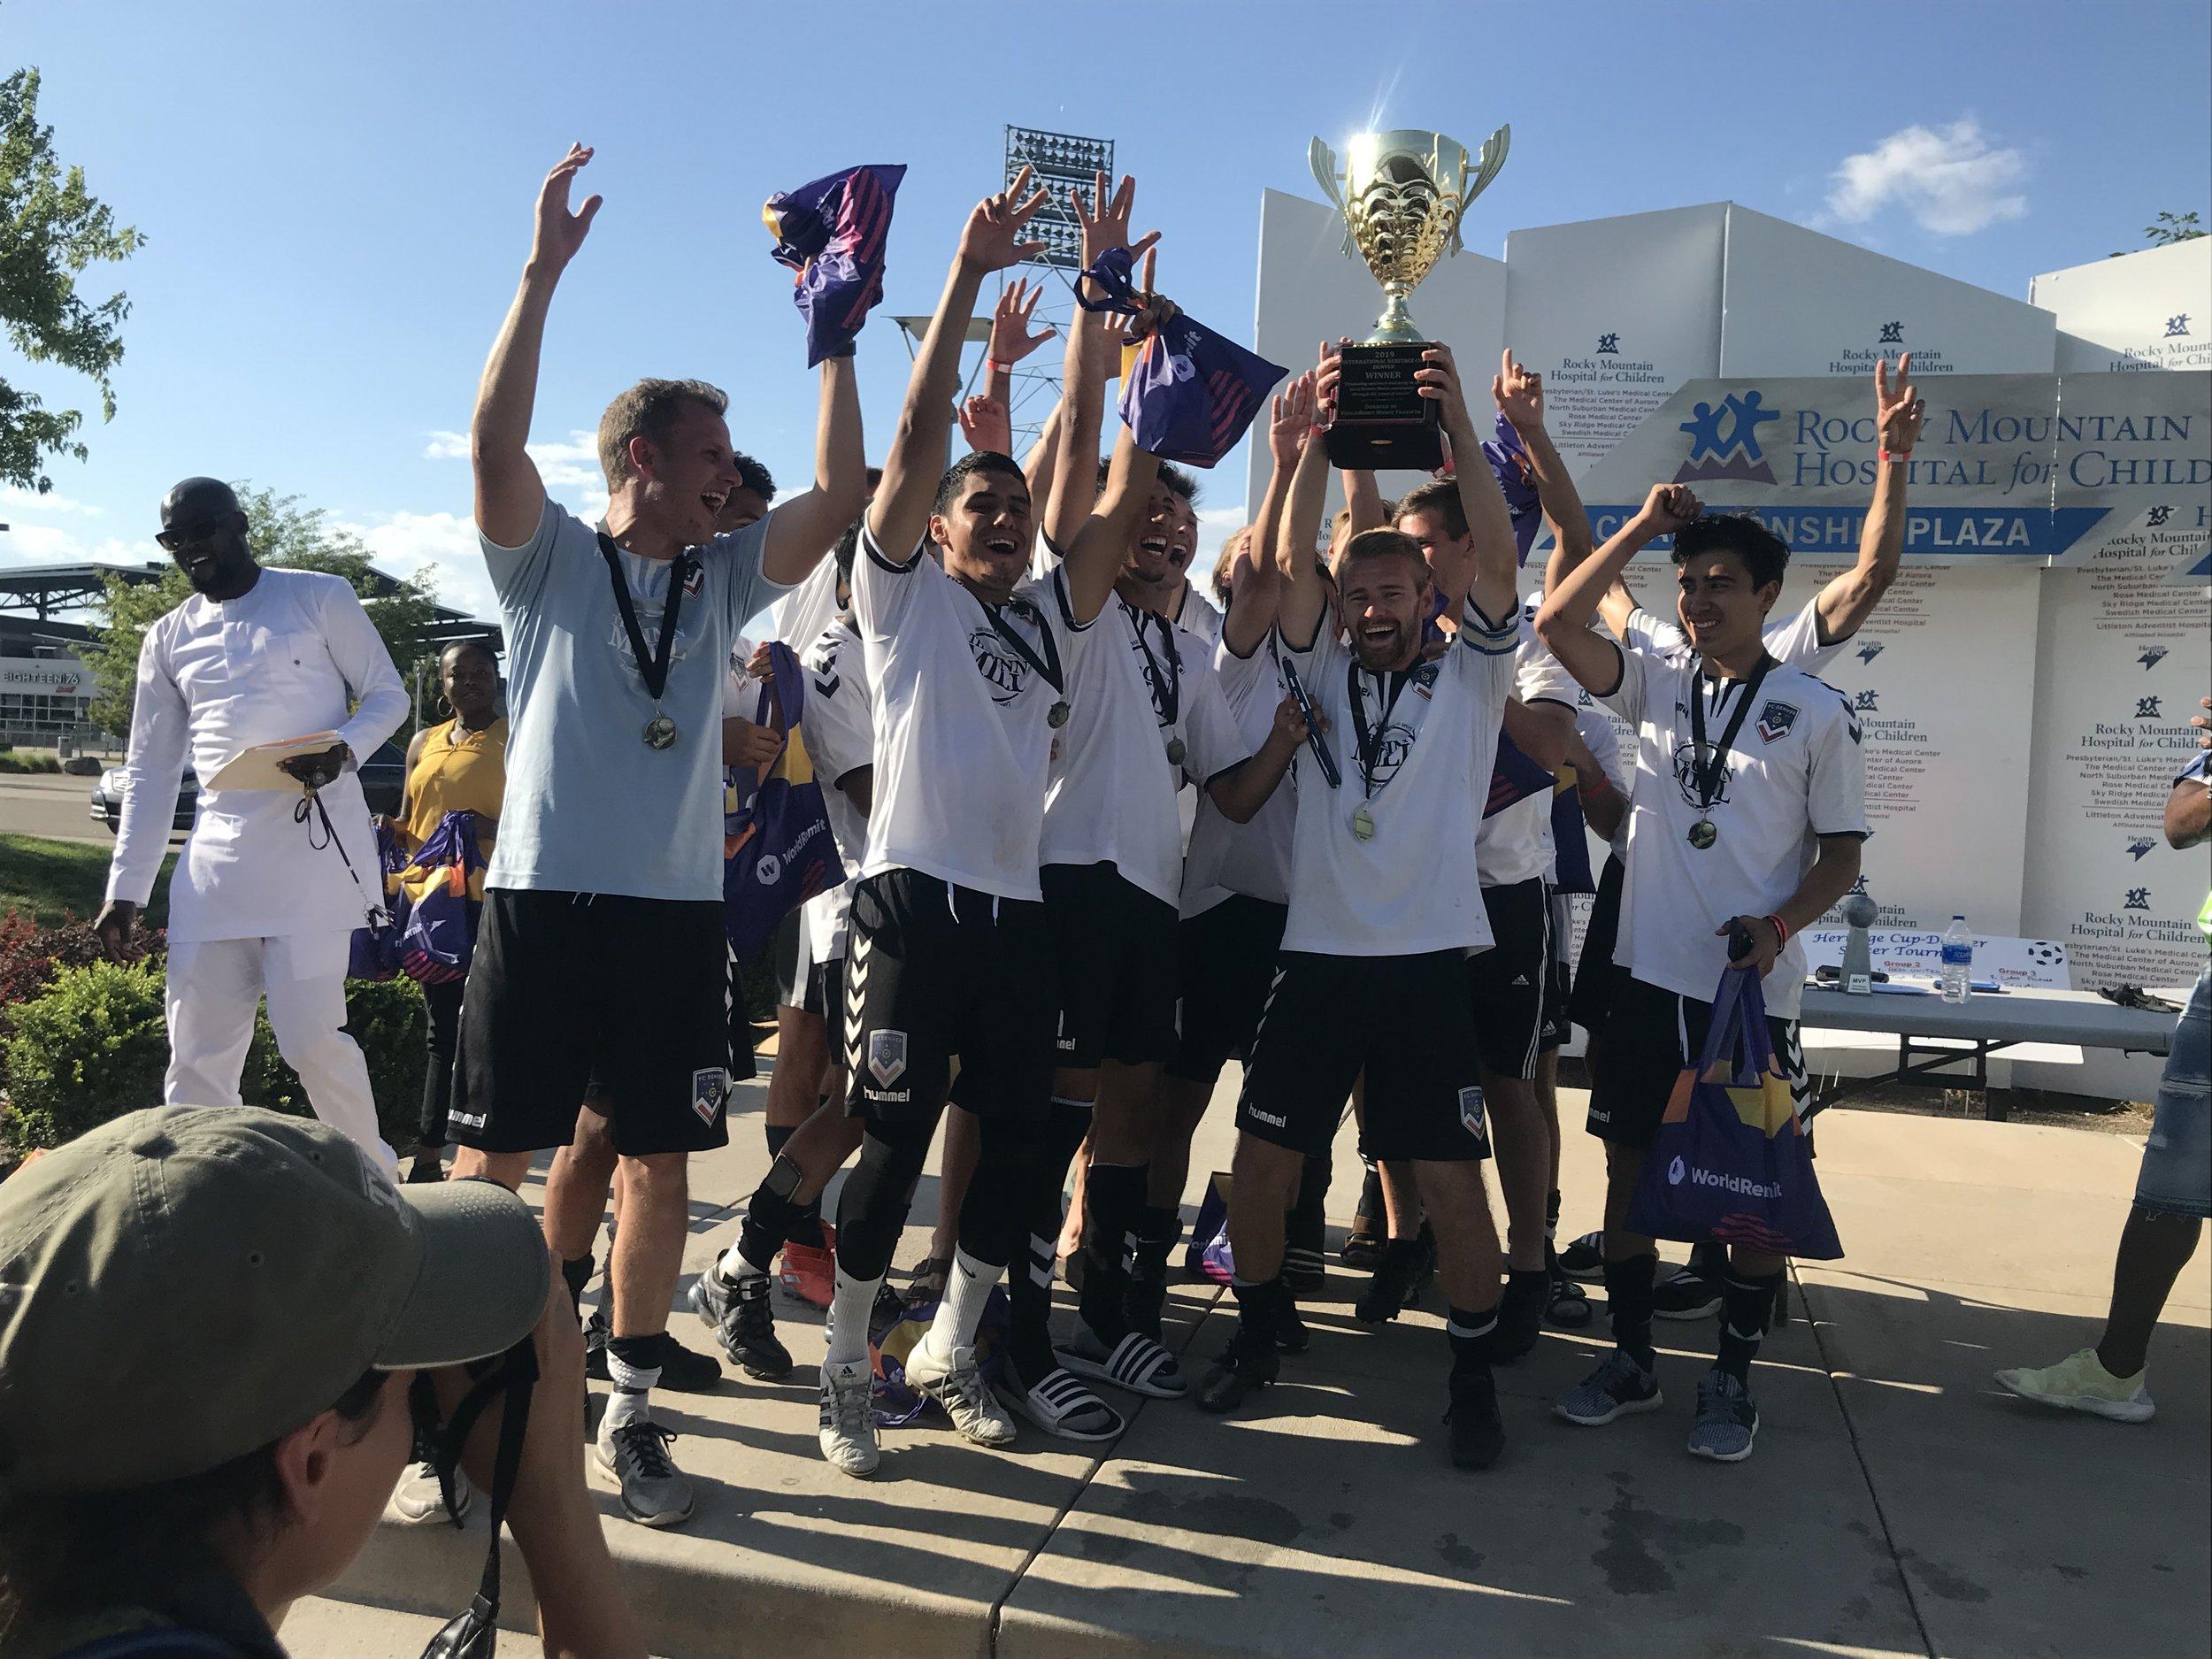 International Heritage Cup Denver Champions